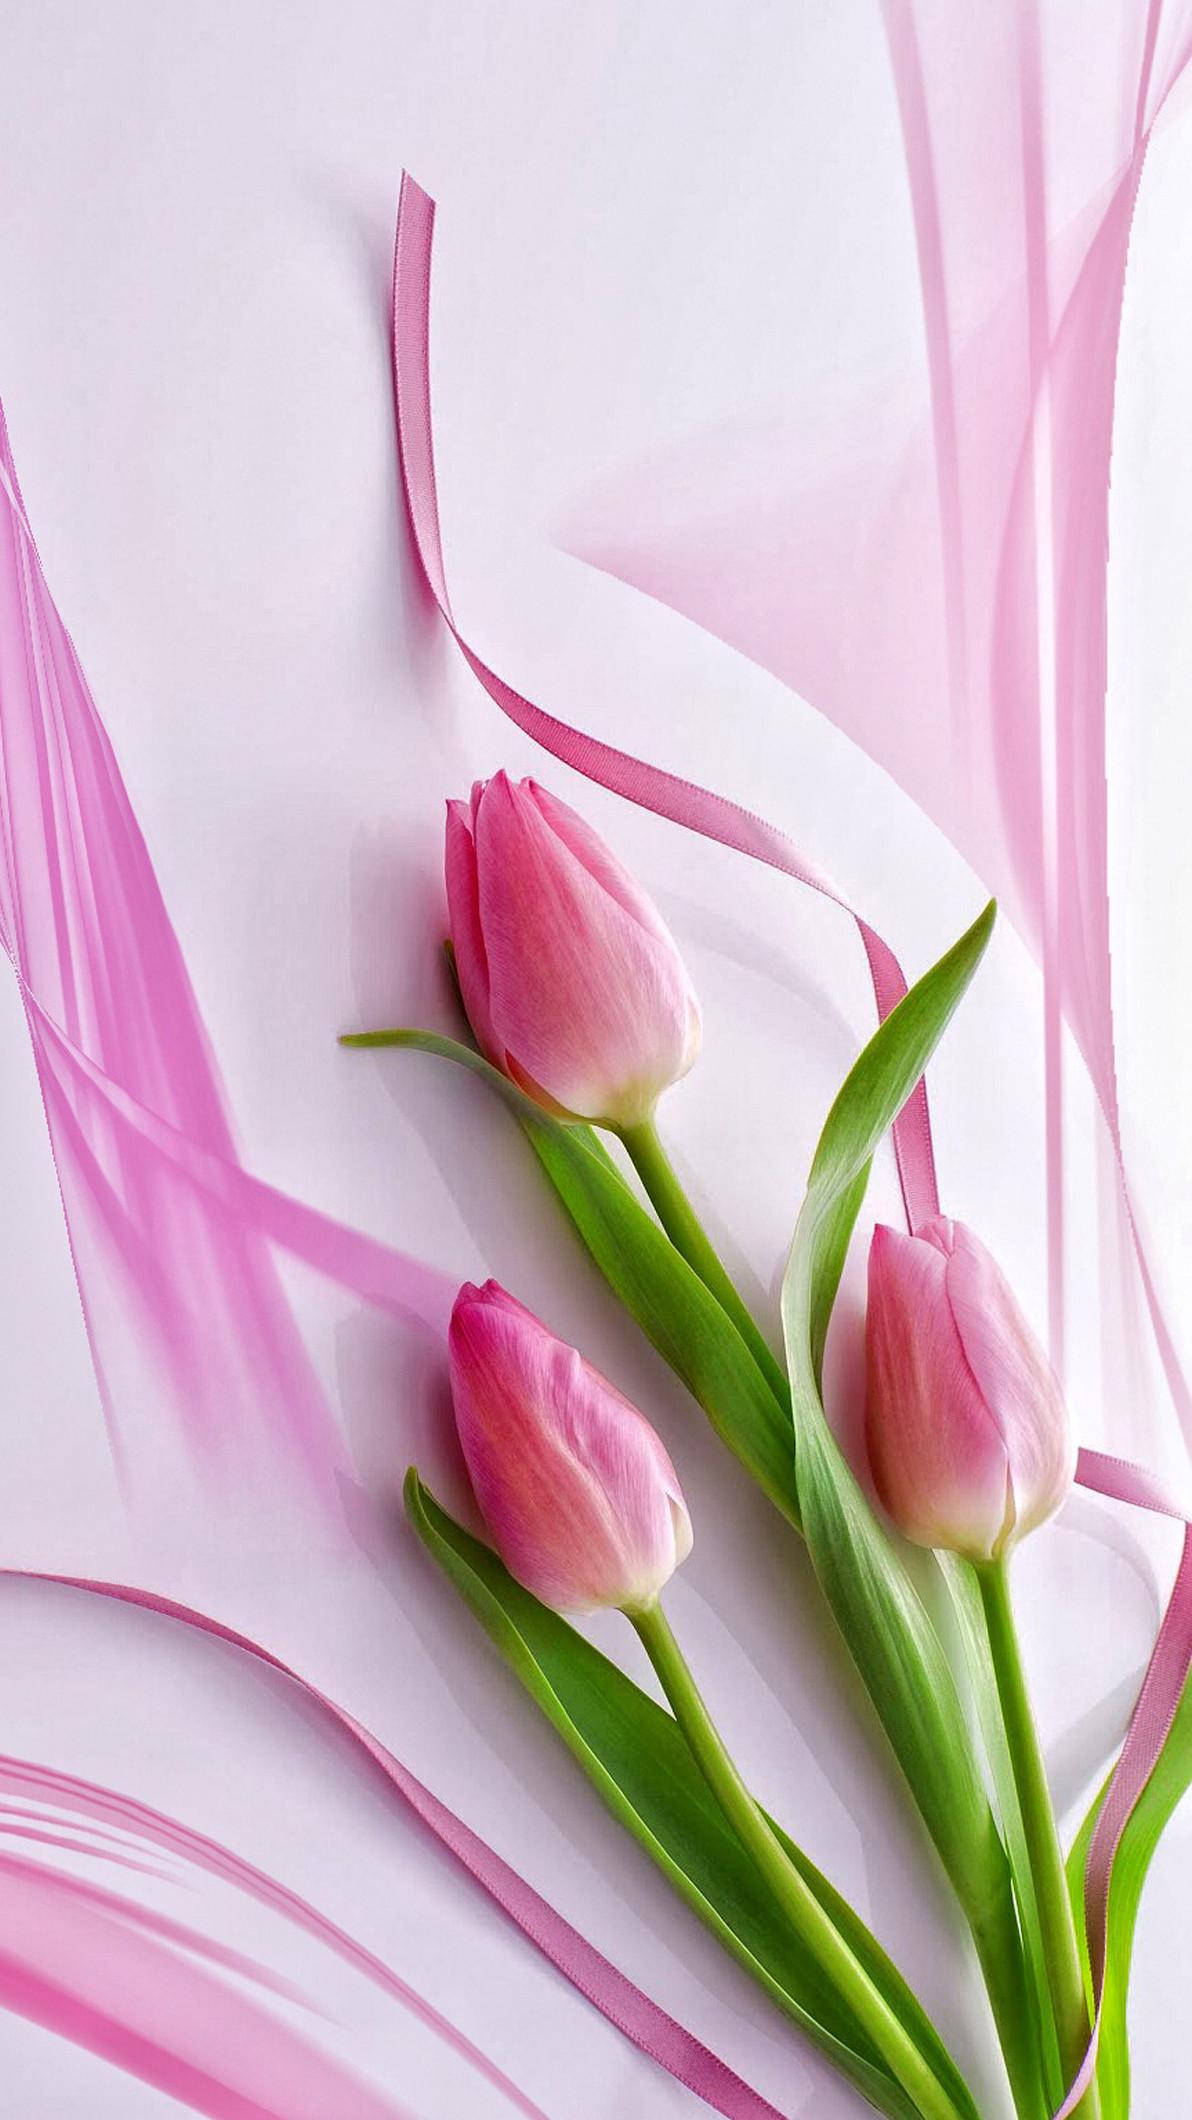 Cute Pink Tulips iPhone 6+ Wallpaper – https://helpyourselfimages.com/